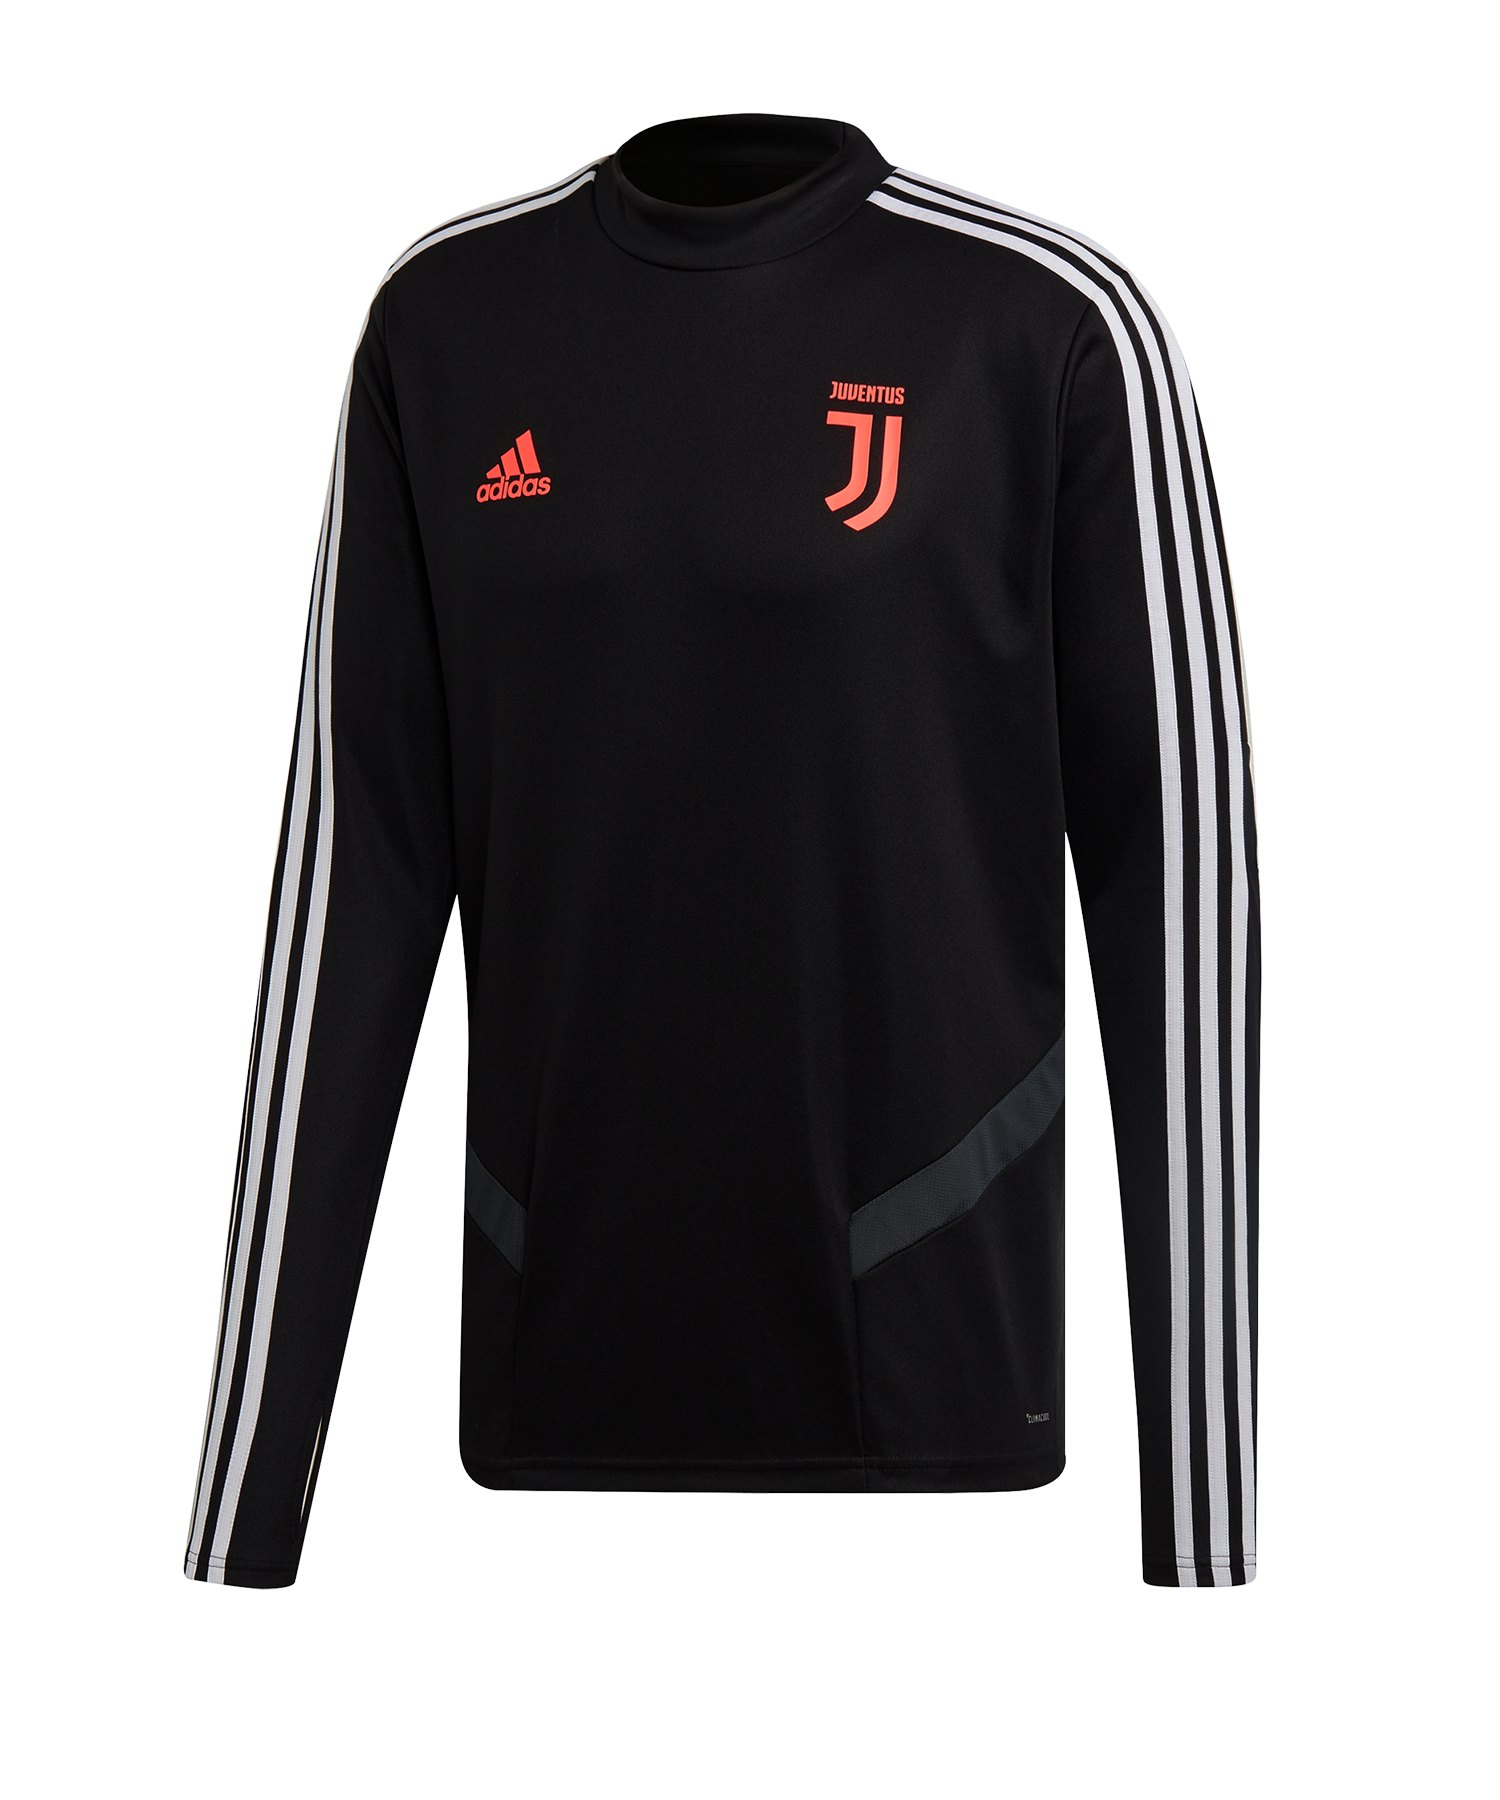 adidas Juventus Turin Trainingstop Schwarz Grau - Schwarz